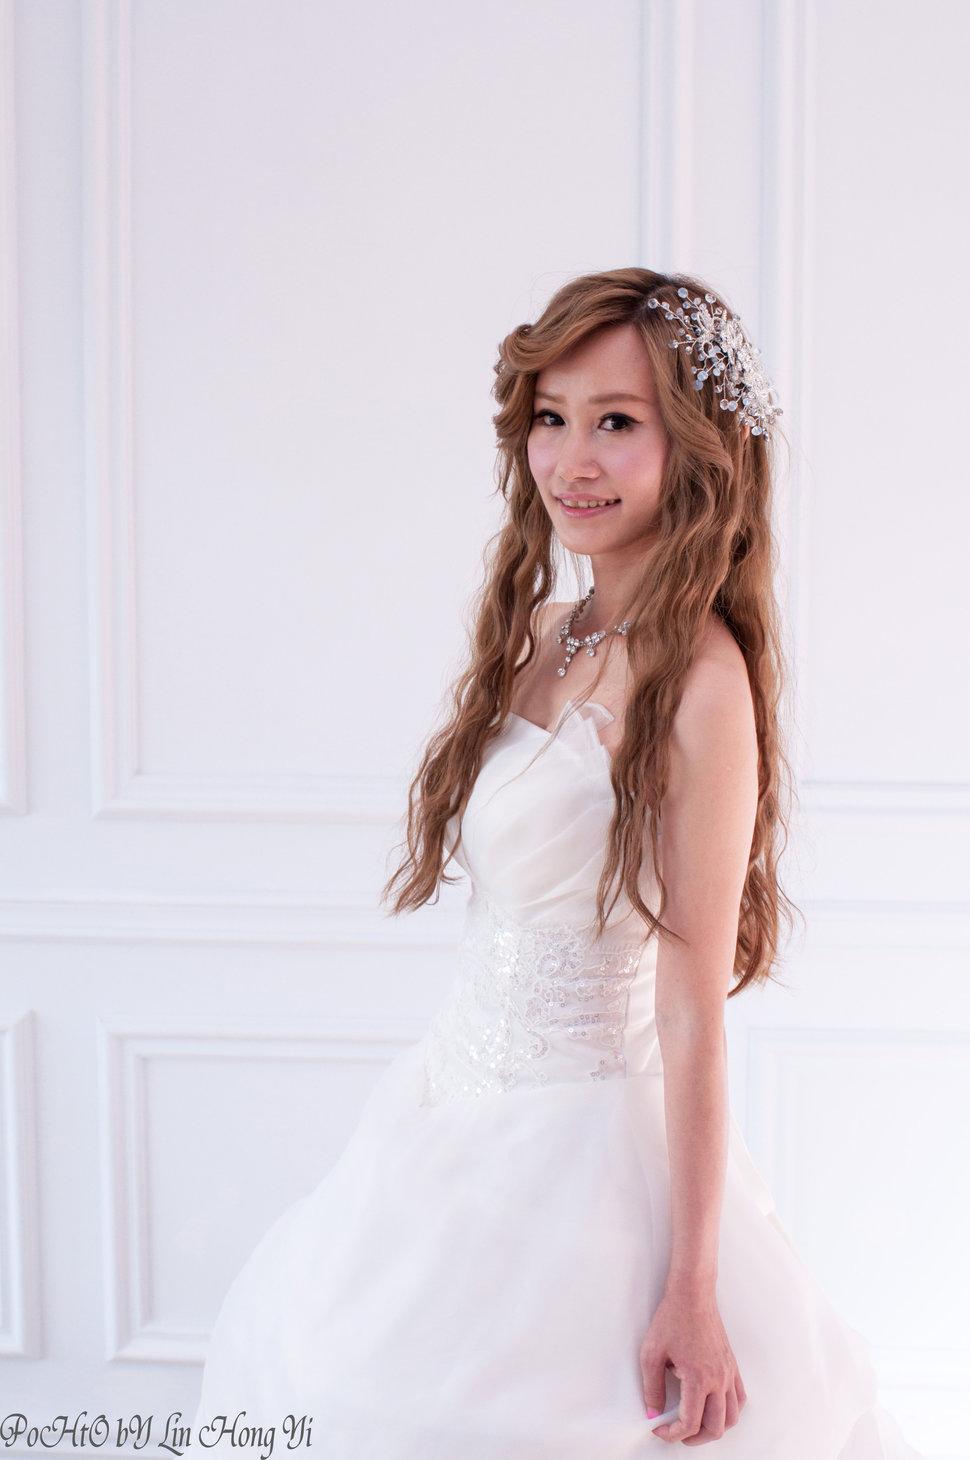 DSC_1224 - 小林哥Hung YI攝影工作室《結婚吧》